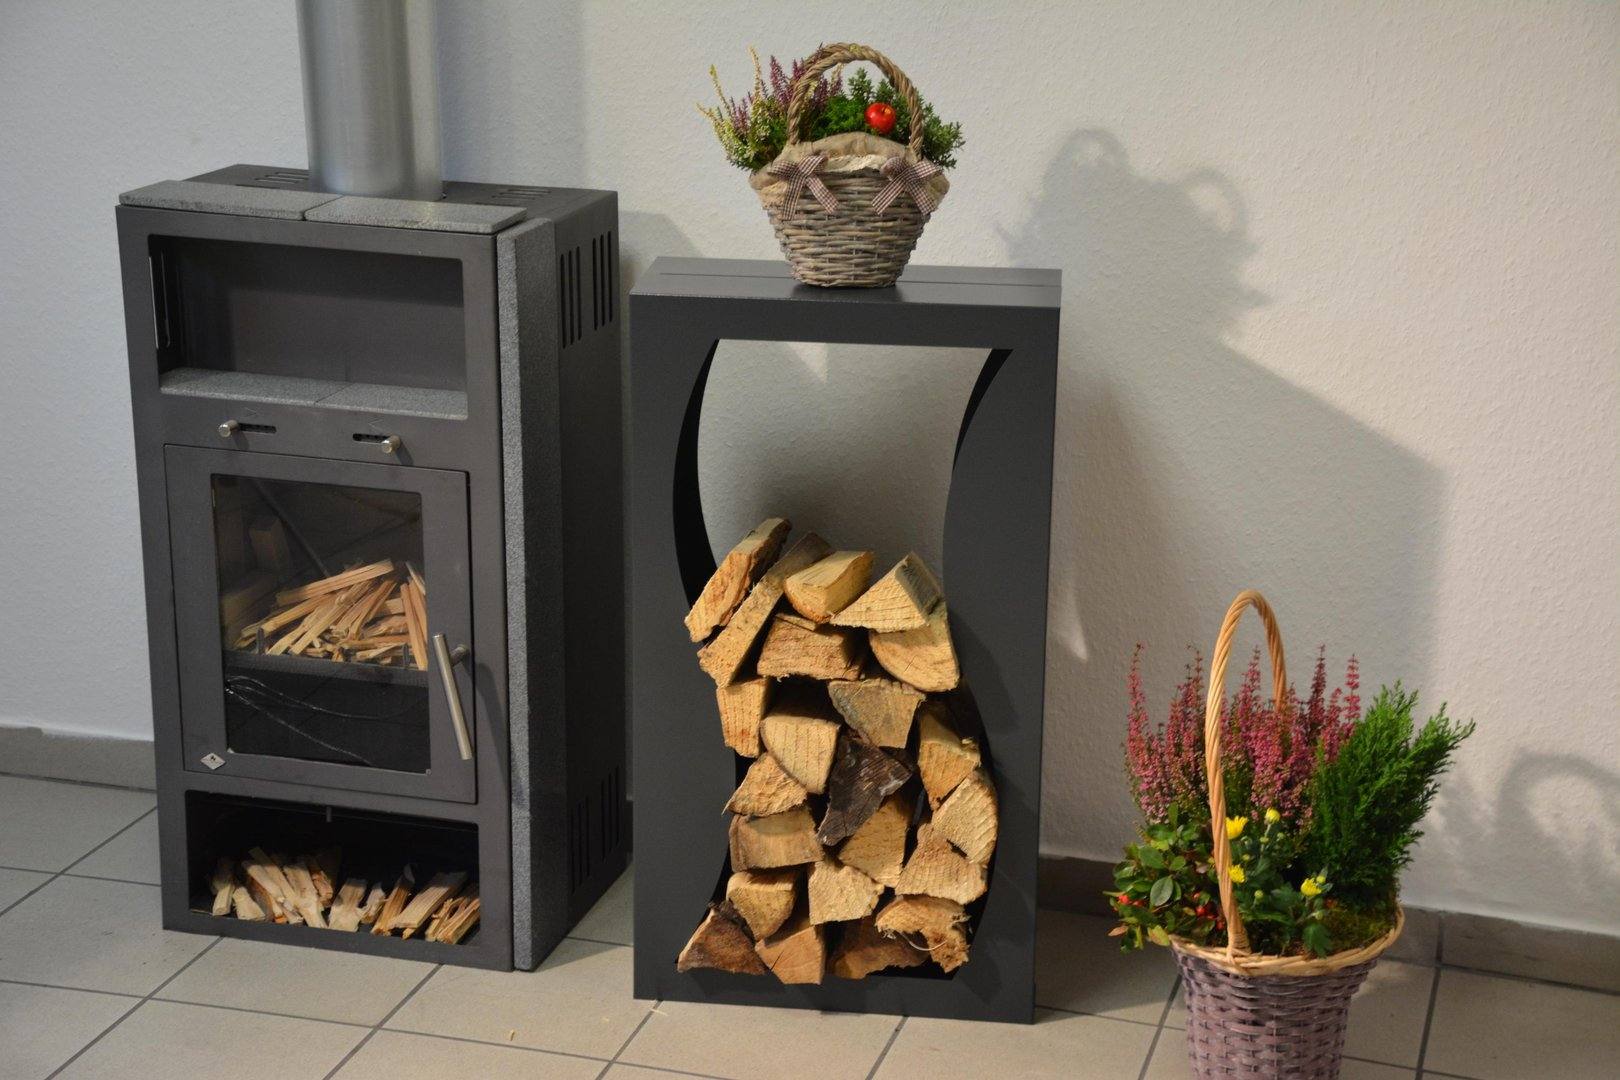 Brennholzregal innenbereich  Kaminholzregal Metall Welle Innenbereich - Regal aus Metall